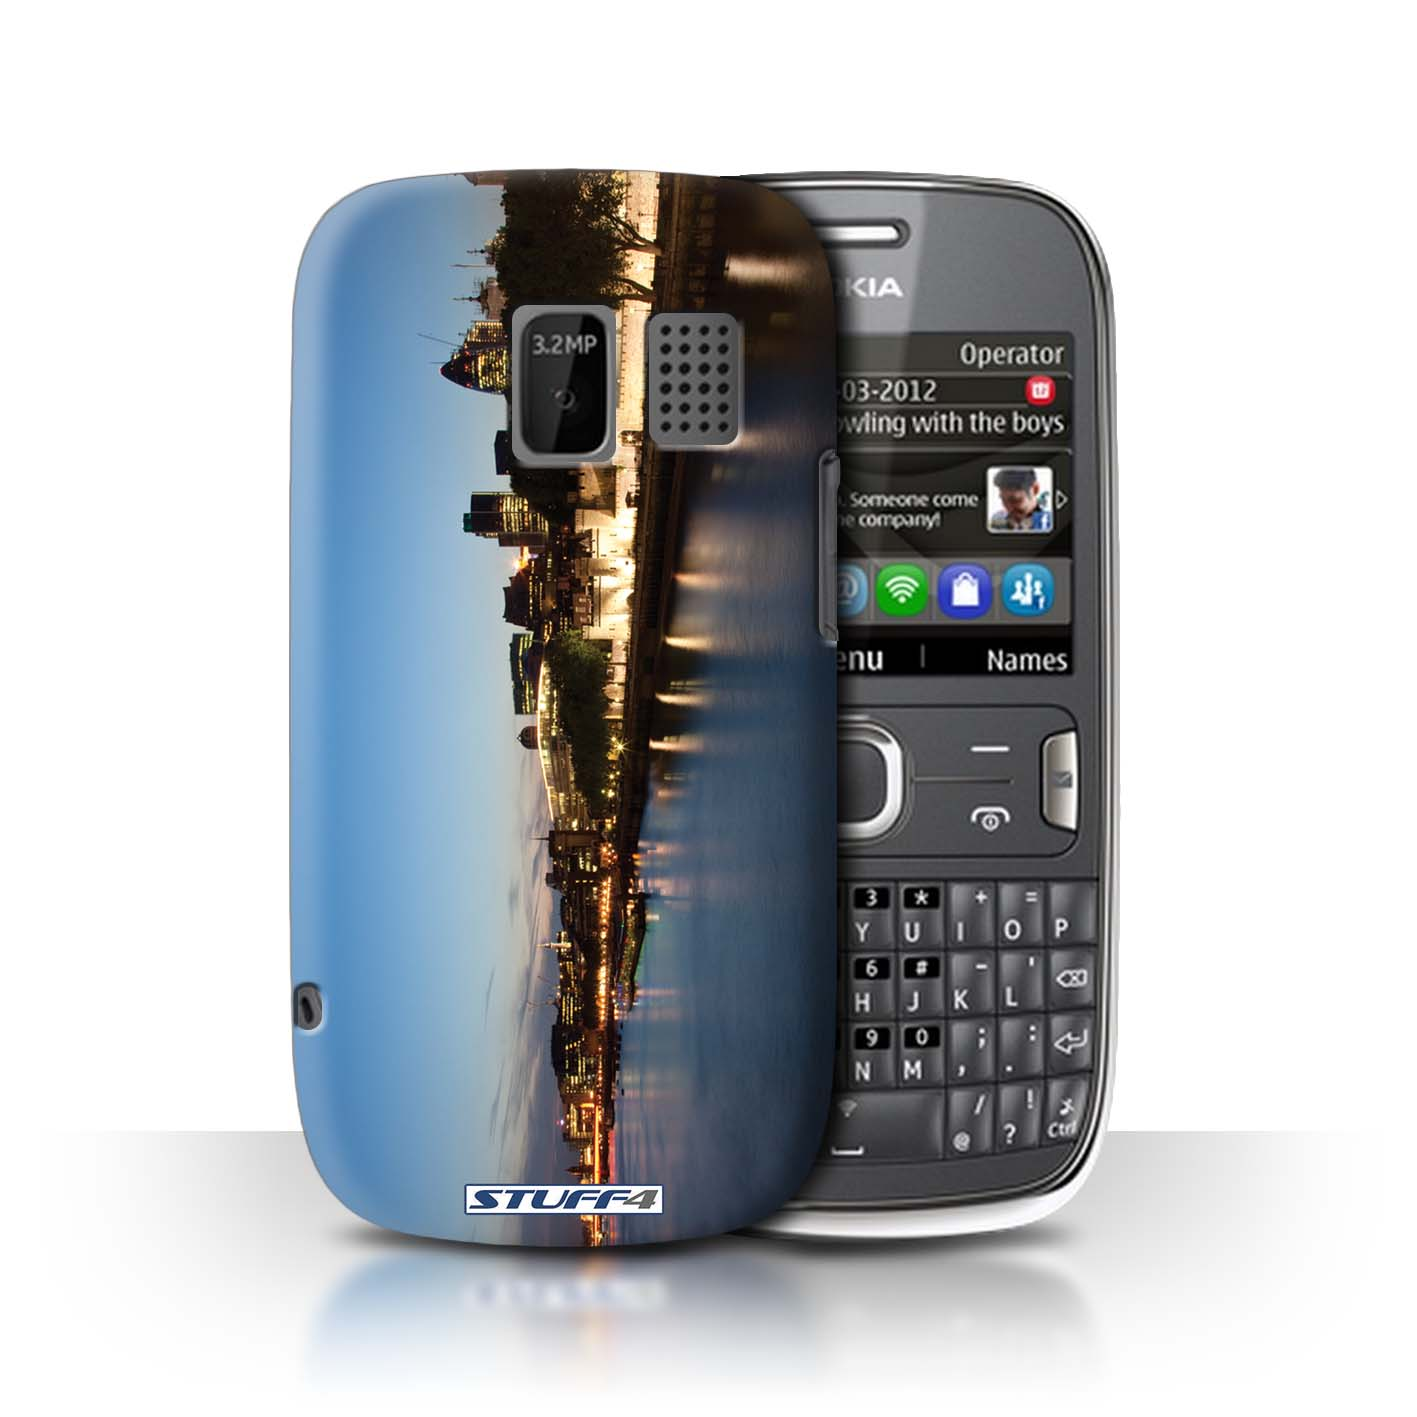 outlet store bda00 0044b Protective Hard Back Case for Nokia Asha 302 / London England Collection /  River Thames